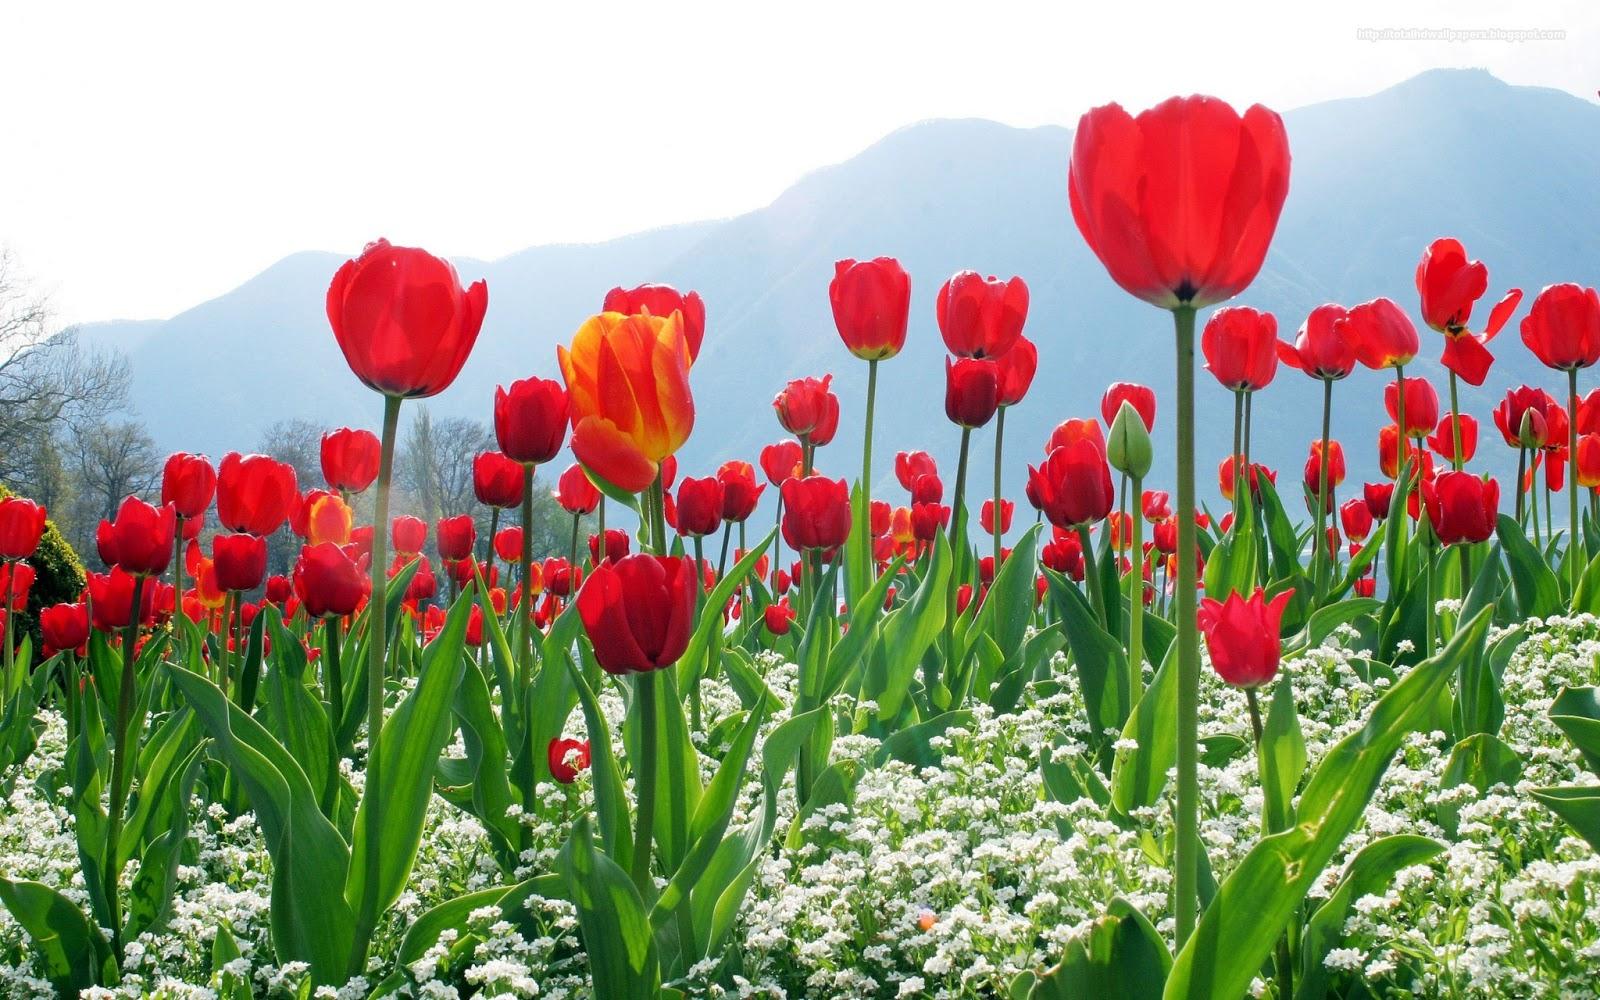 HD Wallpapers: Tulip Hd Wallpapers